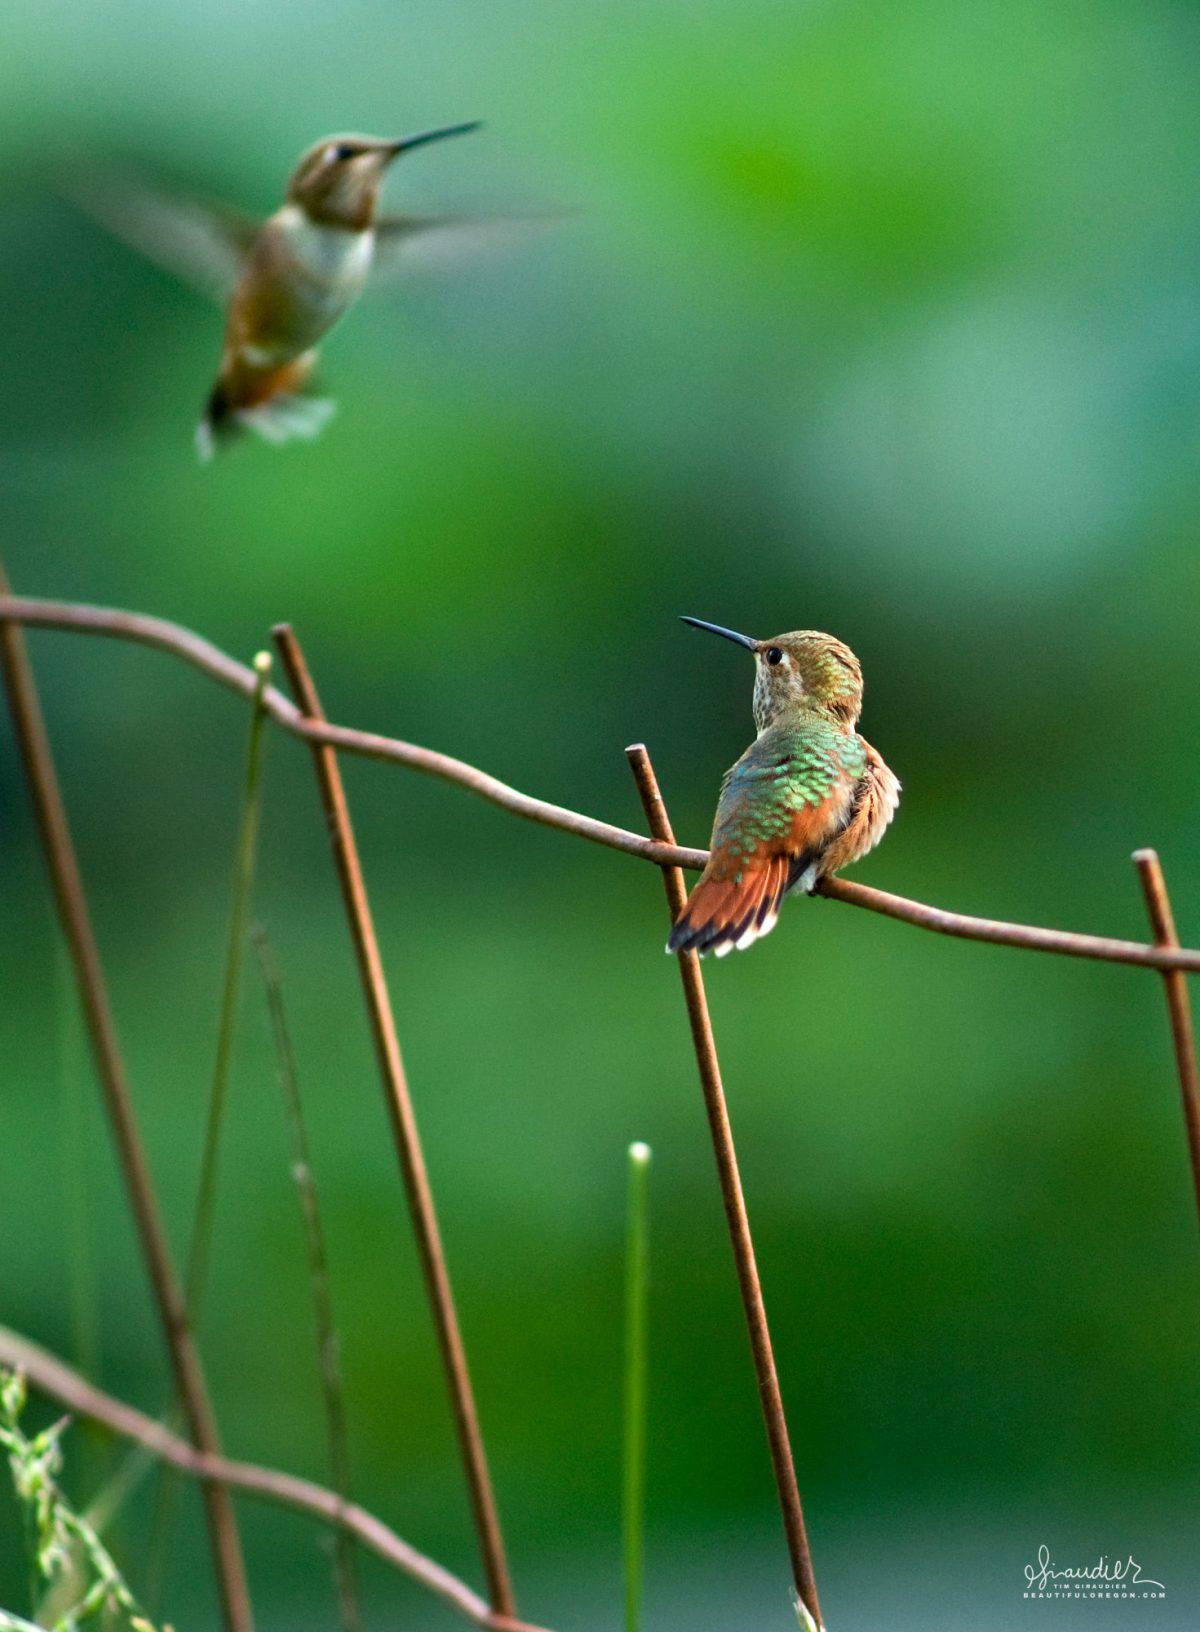 Rufous Hummingbirds (Selasphorus rufus) mating display. birds of Oregon and the Pacific Northwest